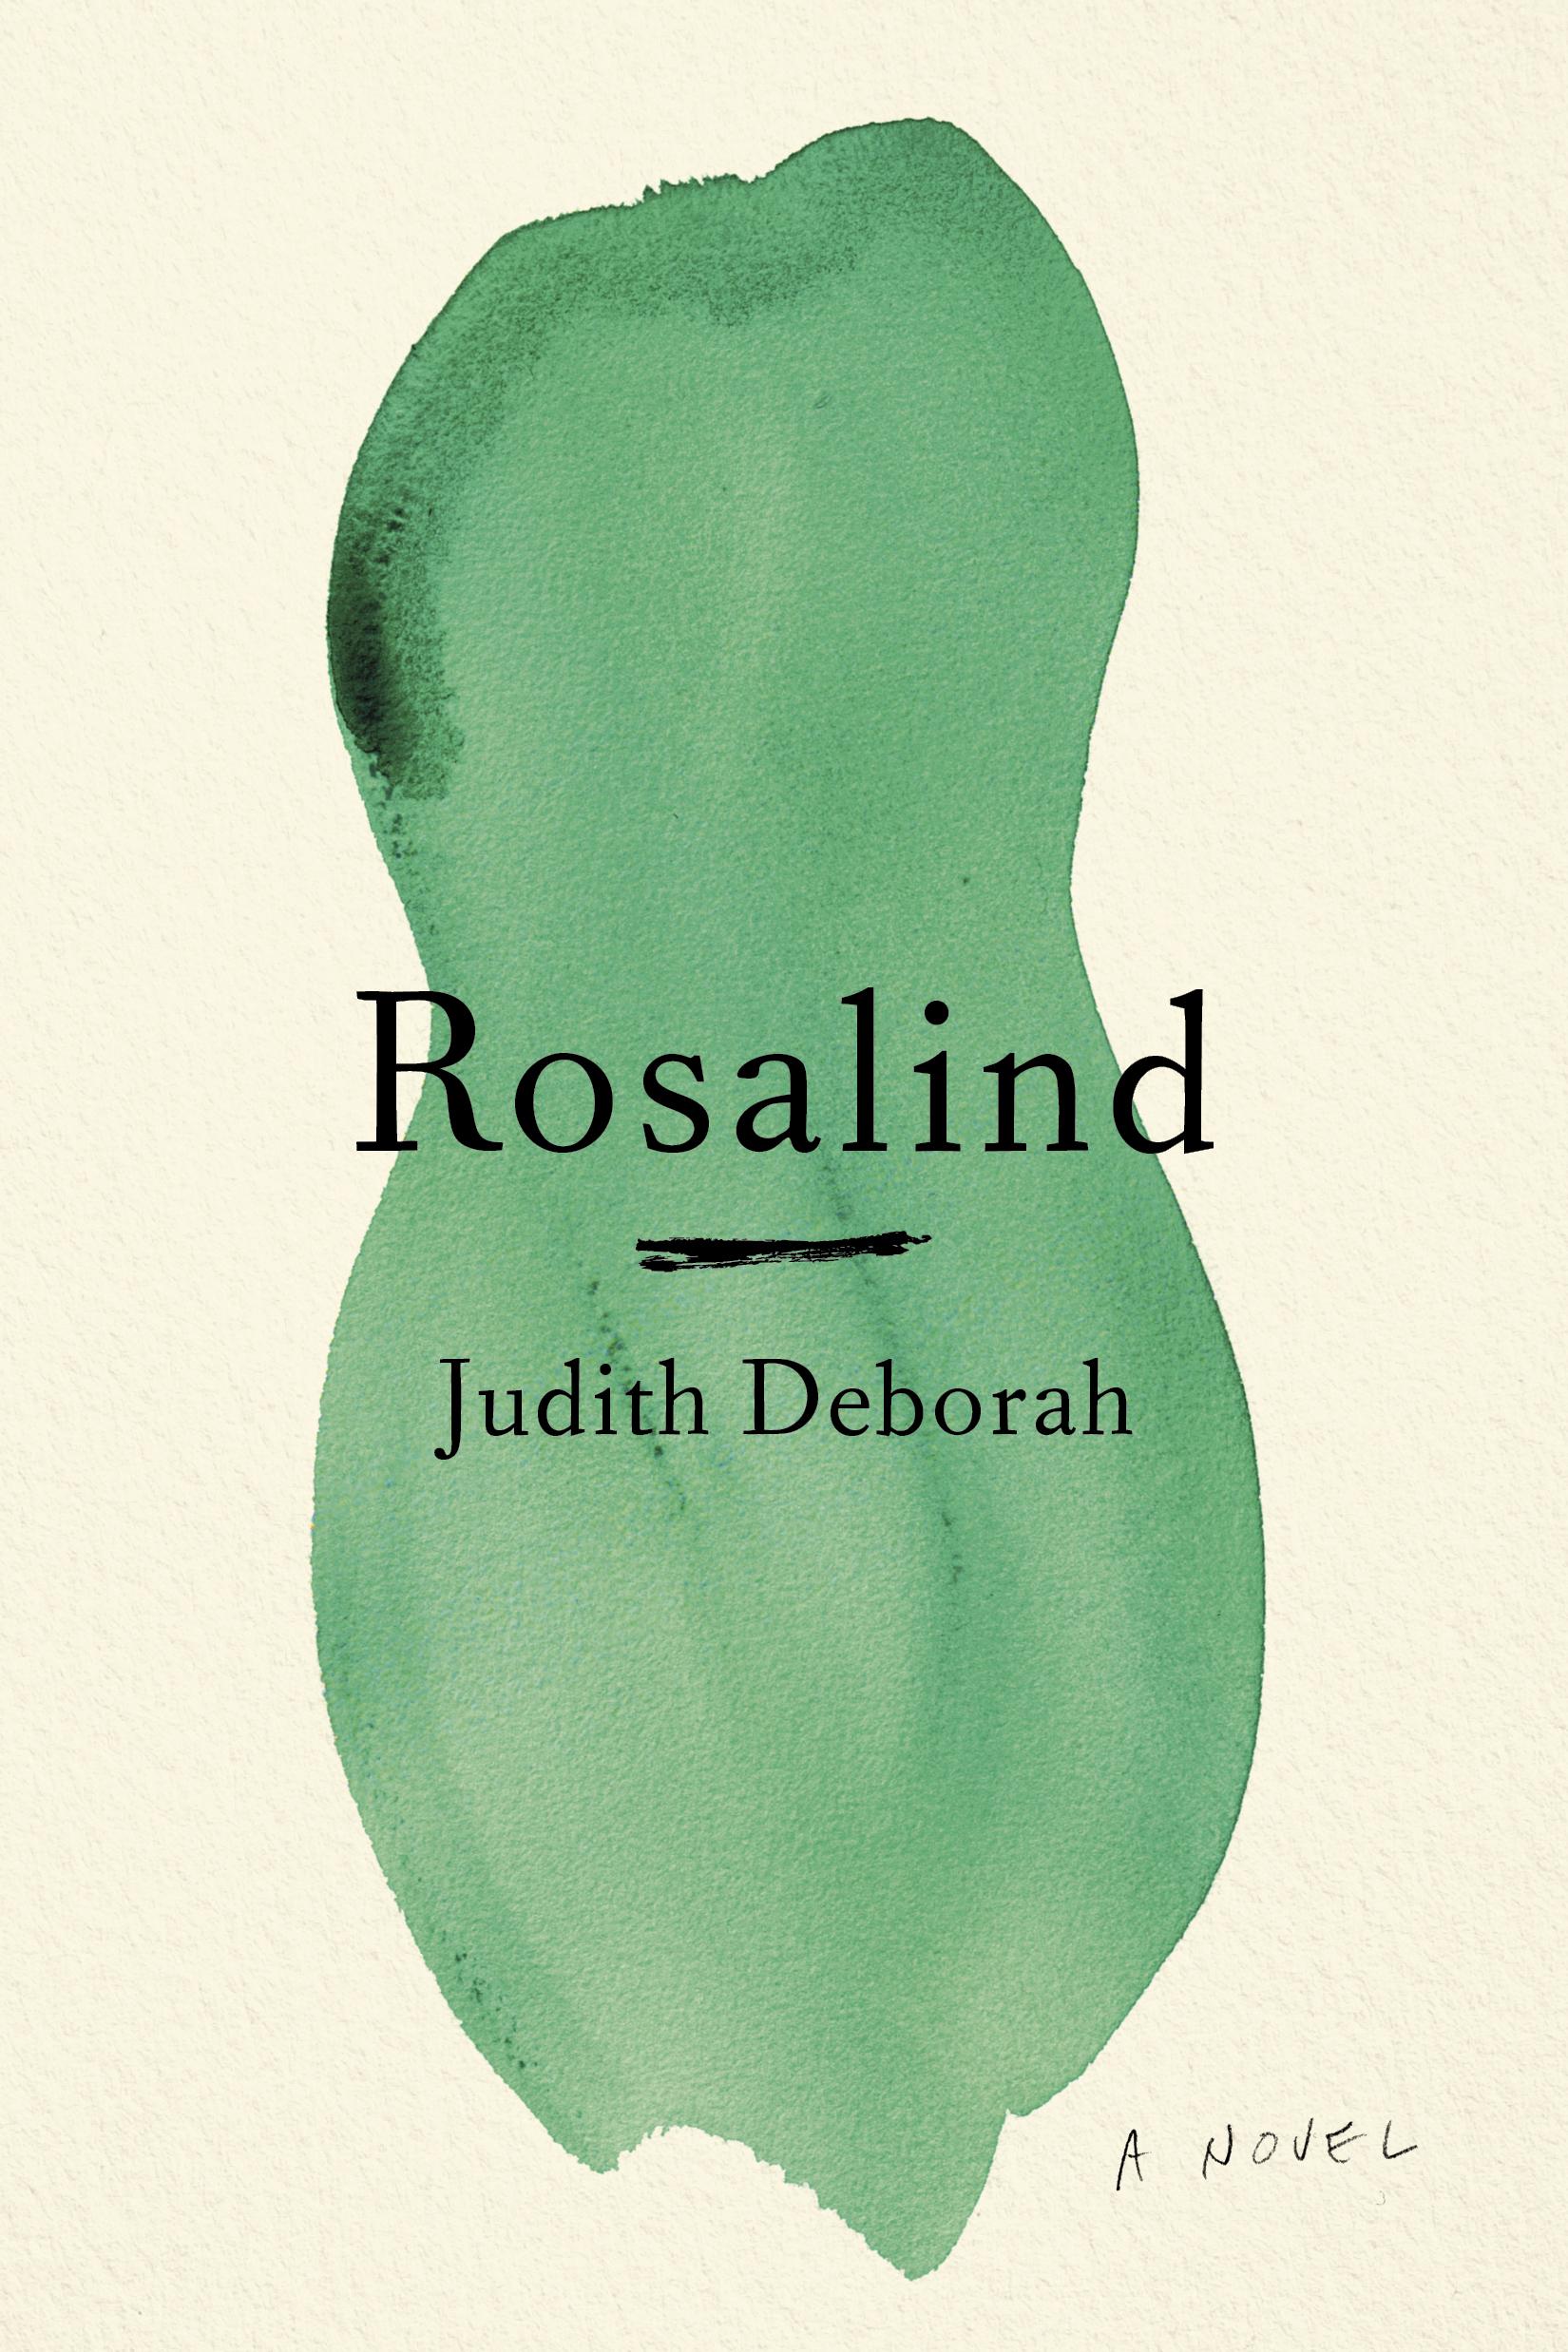 Rosalind_Design7.jpg